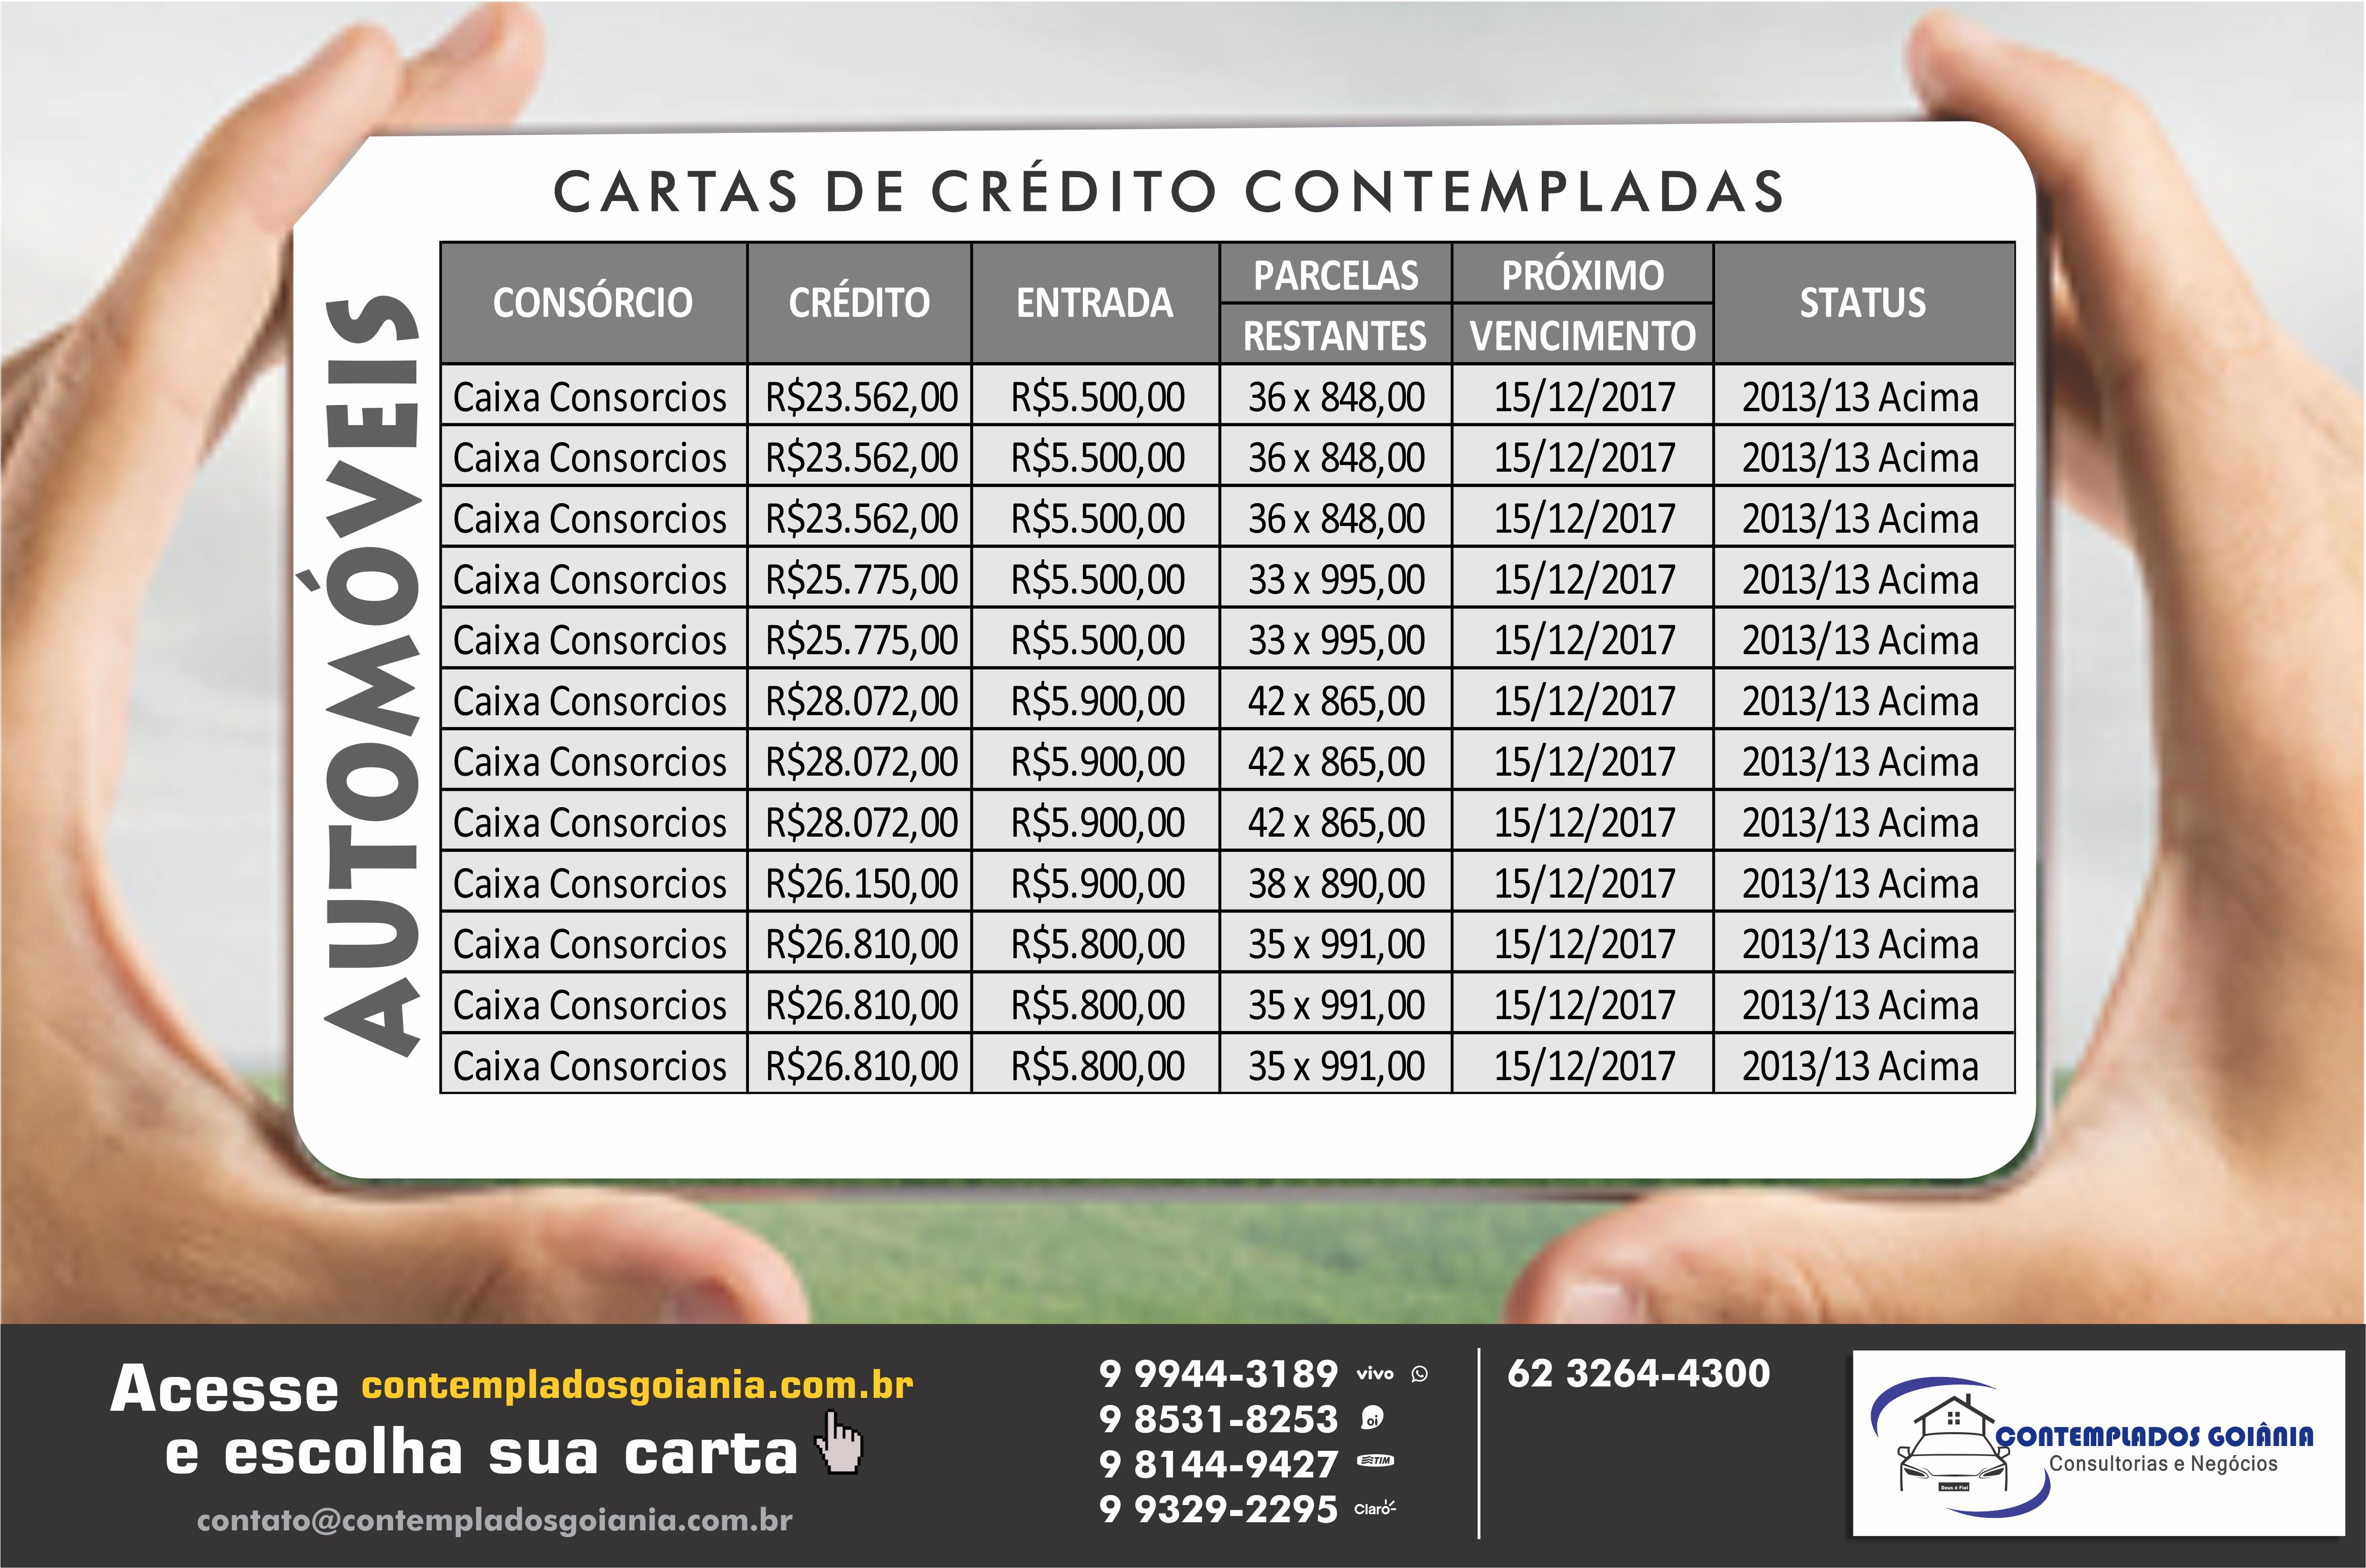 Carta De Credito R 20 720 00 Data De Vencimento 25 12 2017